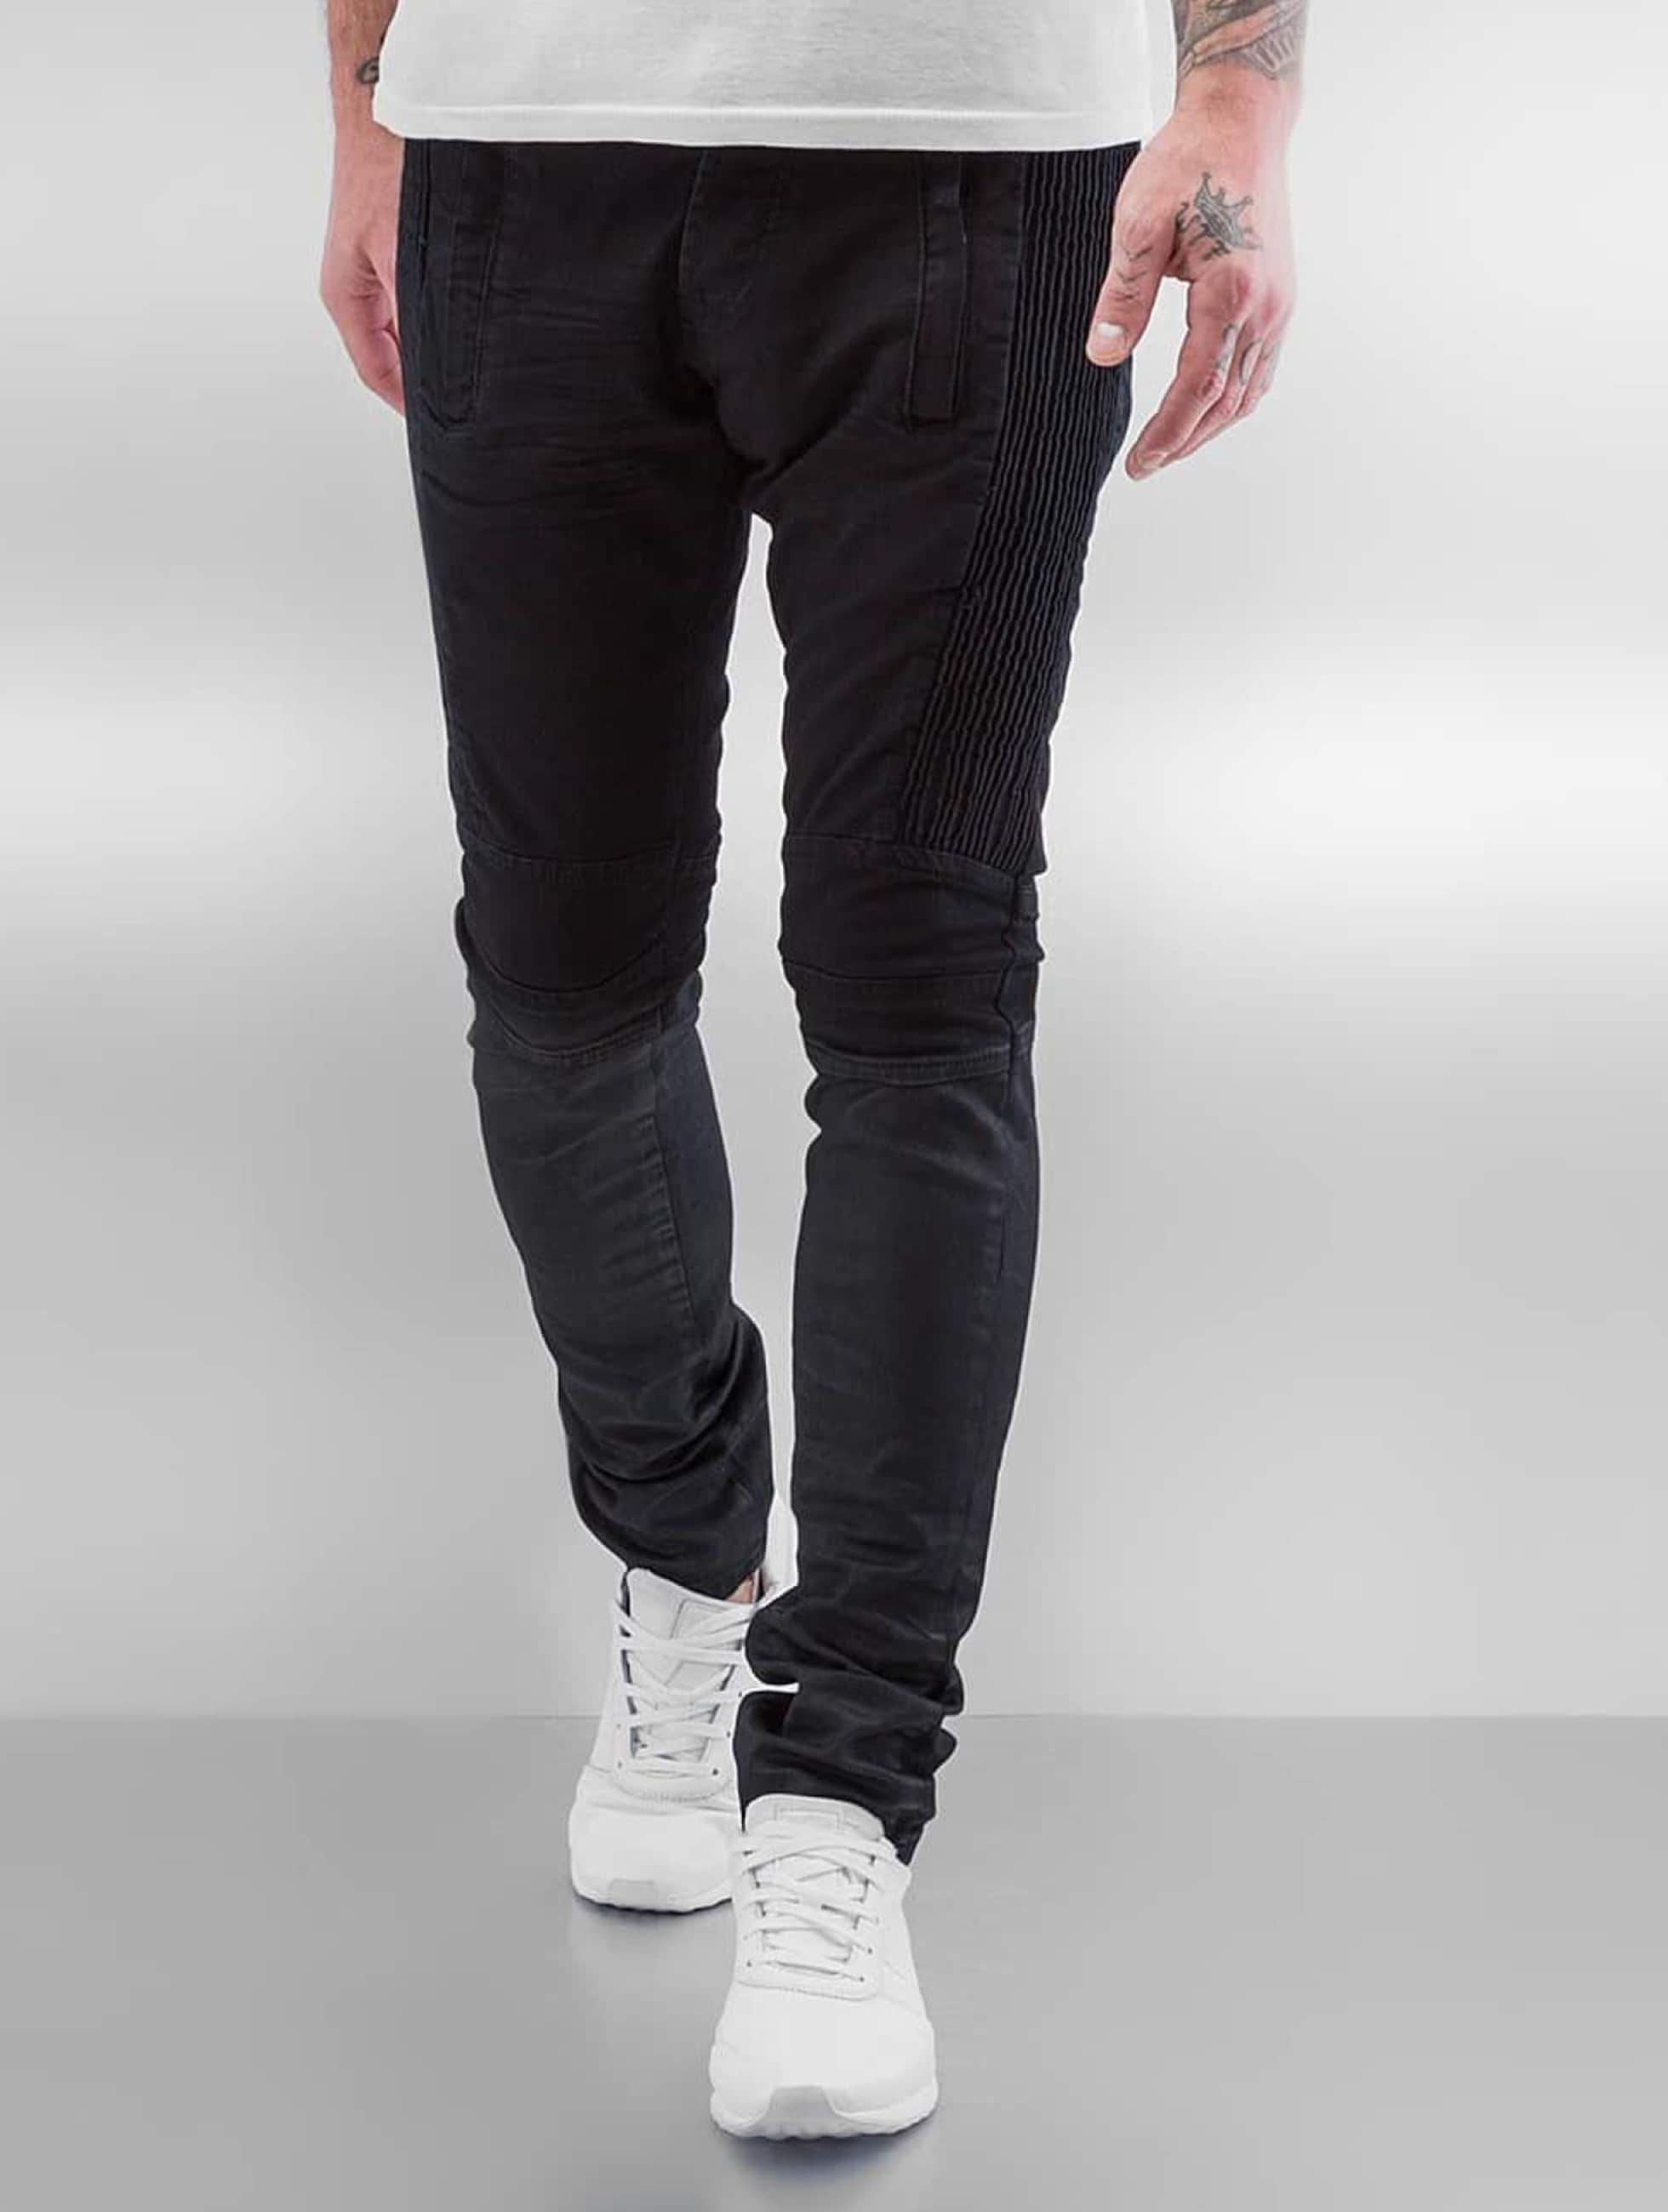 2Y / Skinny Jeans Vlora in black W 31